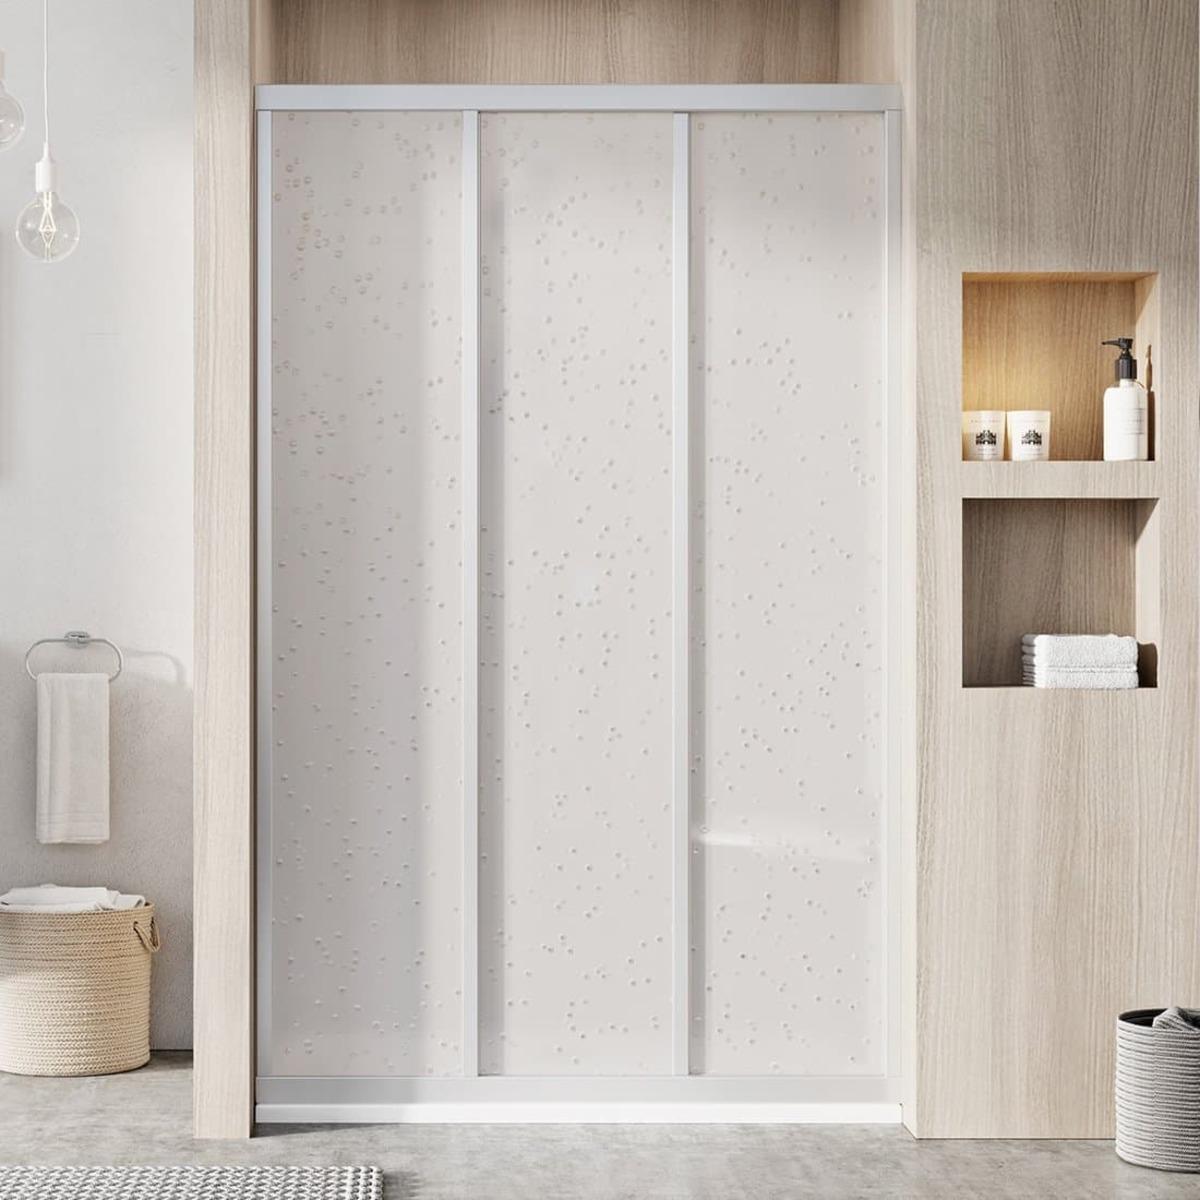 Sprchové dveře 120 cm Ravak Supernova 00VG0UR211